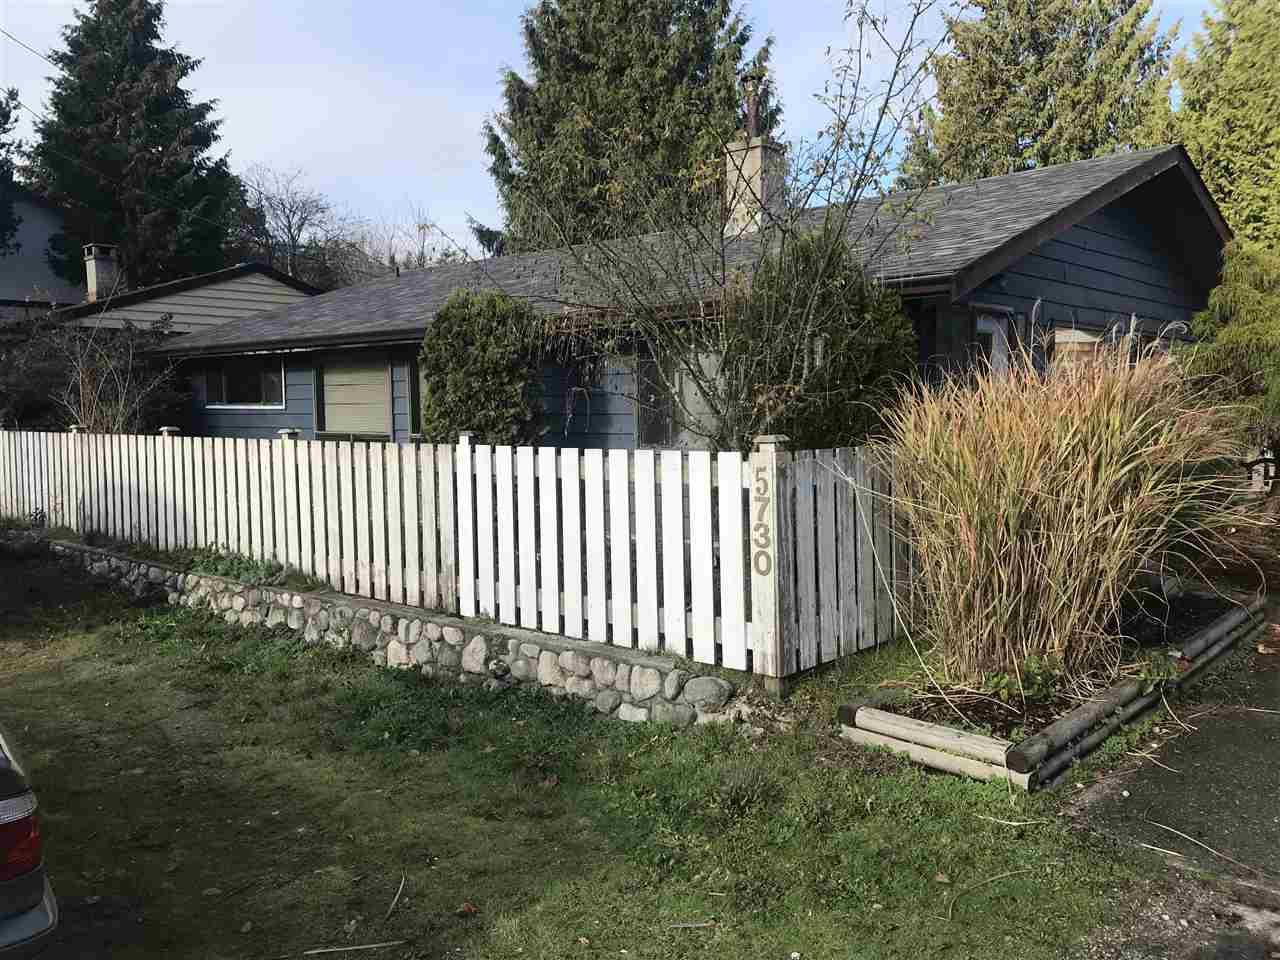 Main Photo: 5730 PEBBLES Crescent in Sechelt: Sechelt District House for sale (Sunshine Coast)  : MLS®# R2323525